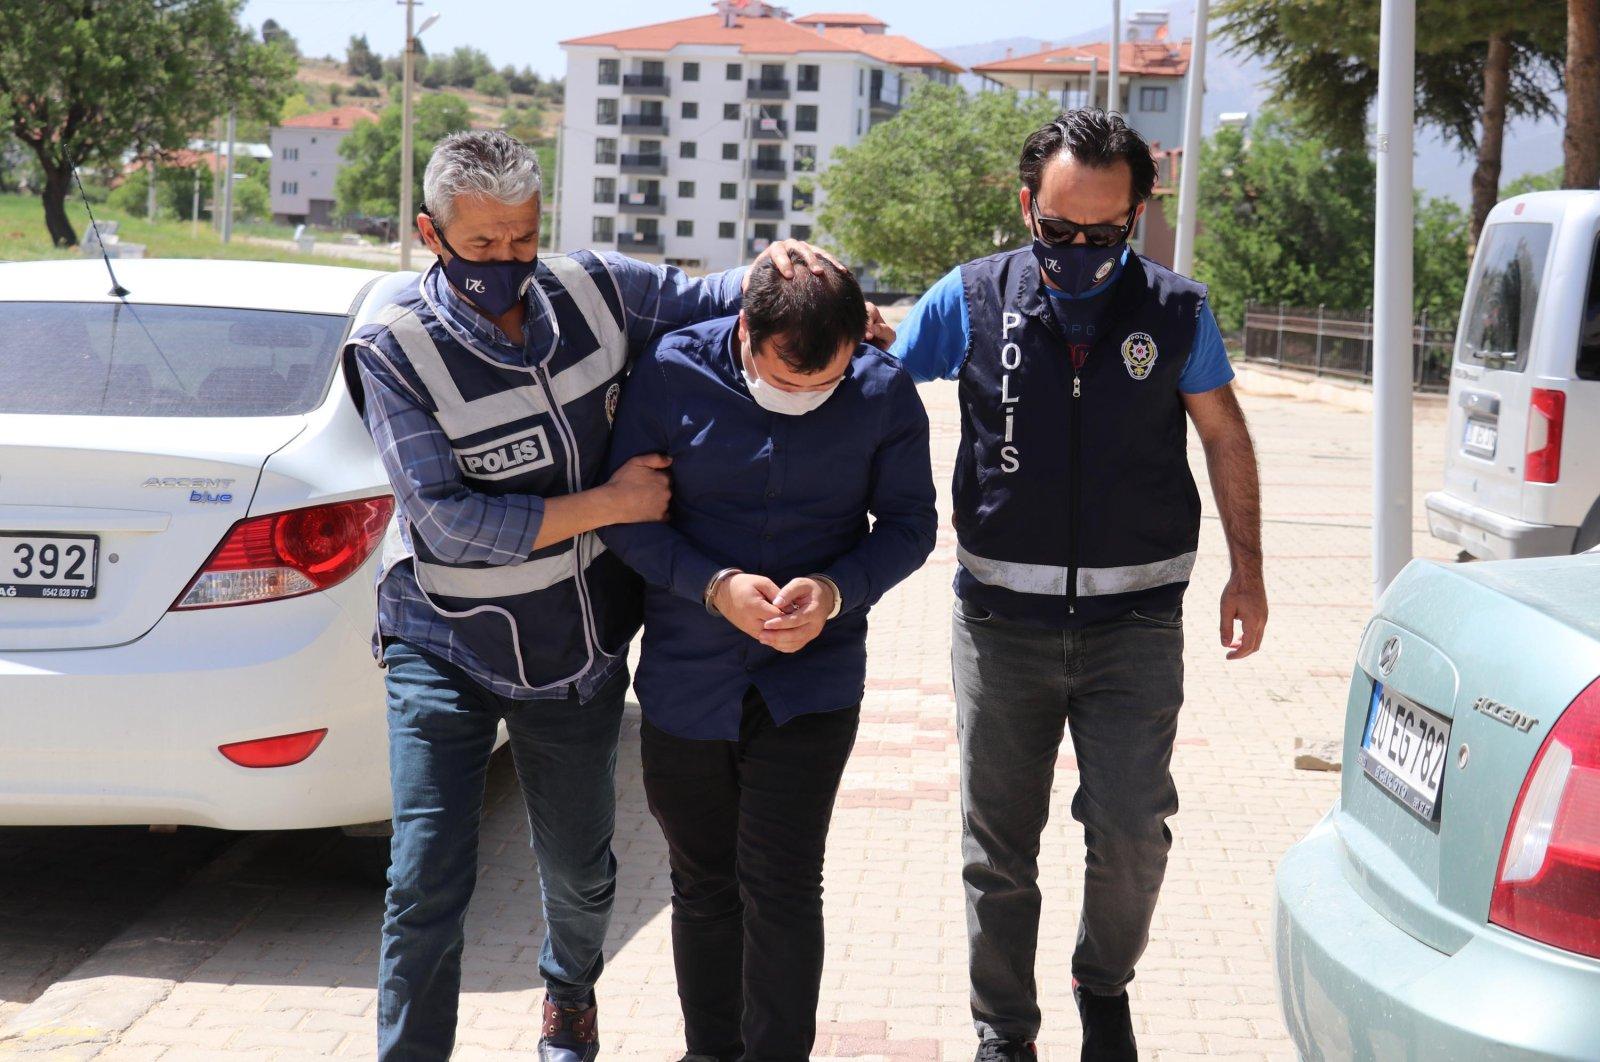 Halil Baki Çelen (C) is arrested by Turkish police in Denizli, Turkey, May 5, 2021. (DHA Photo)